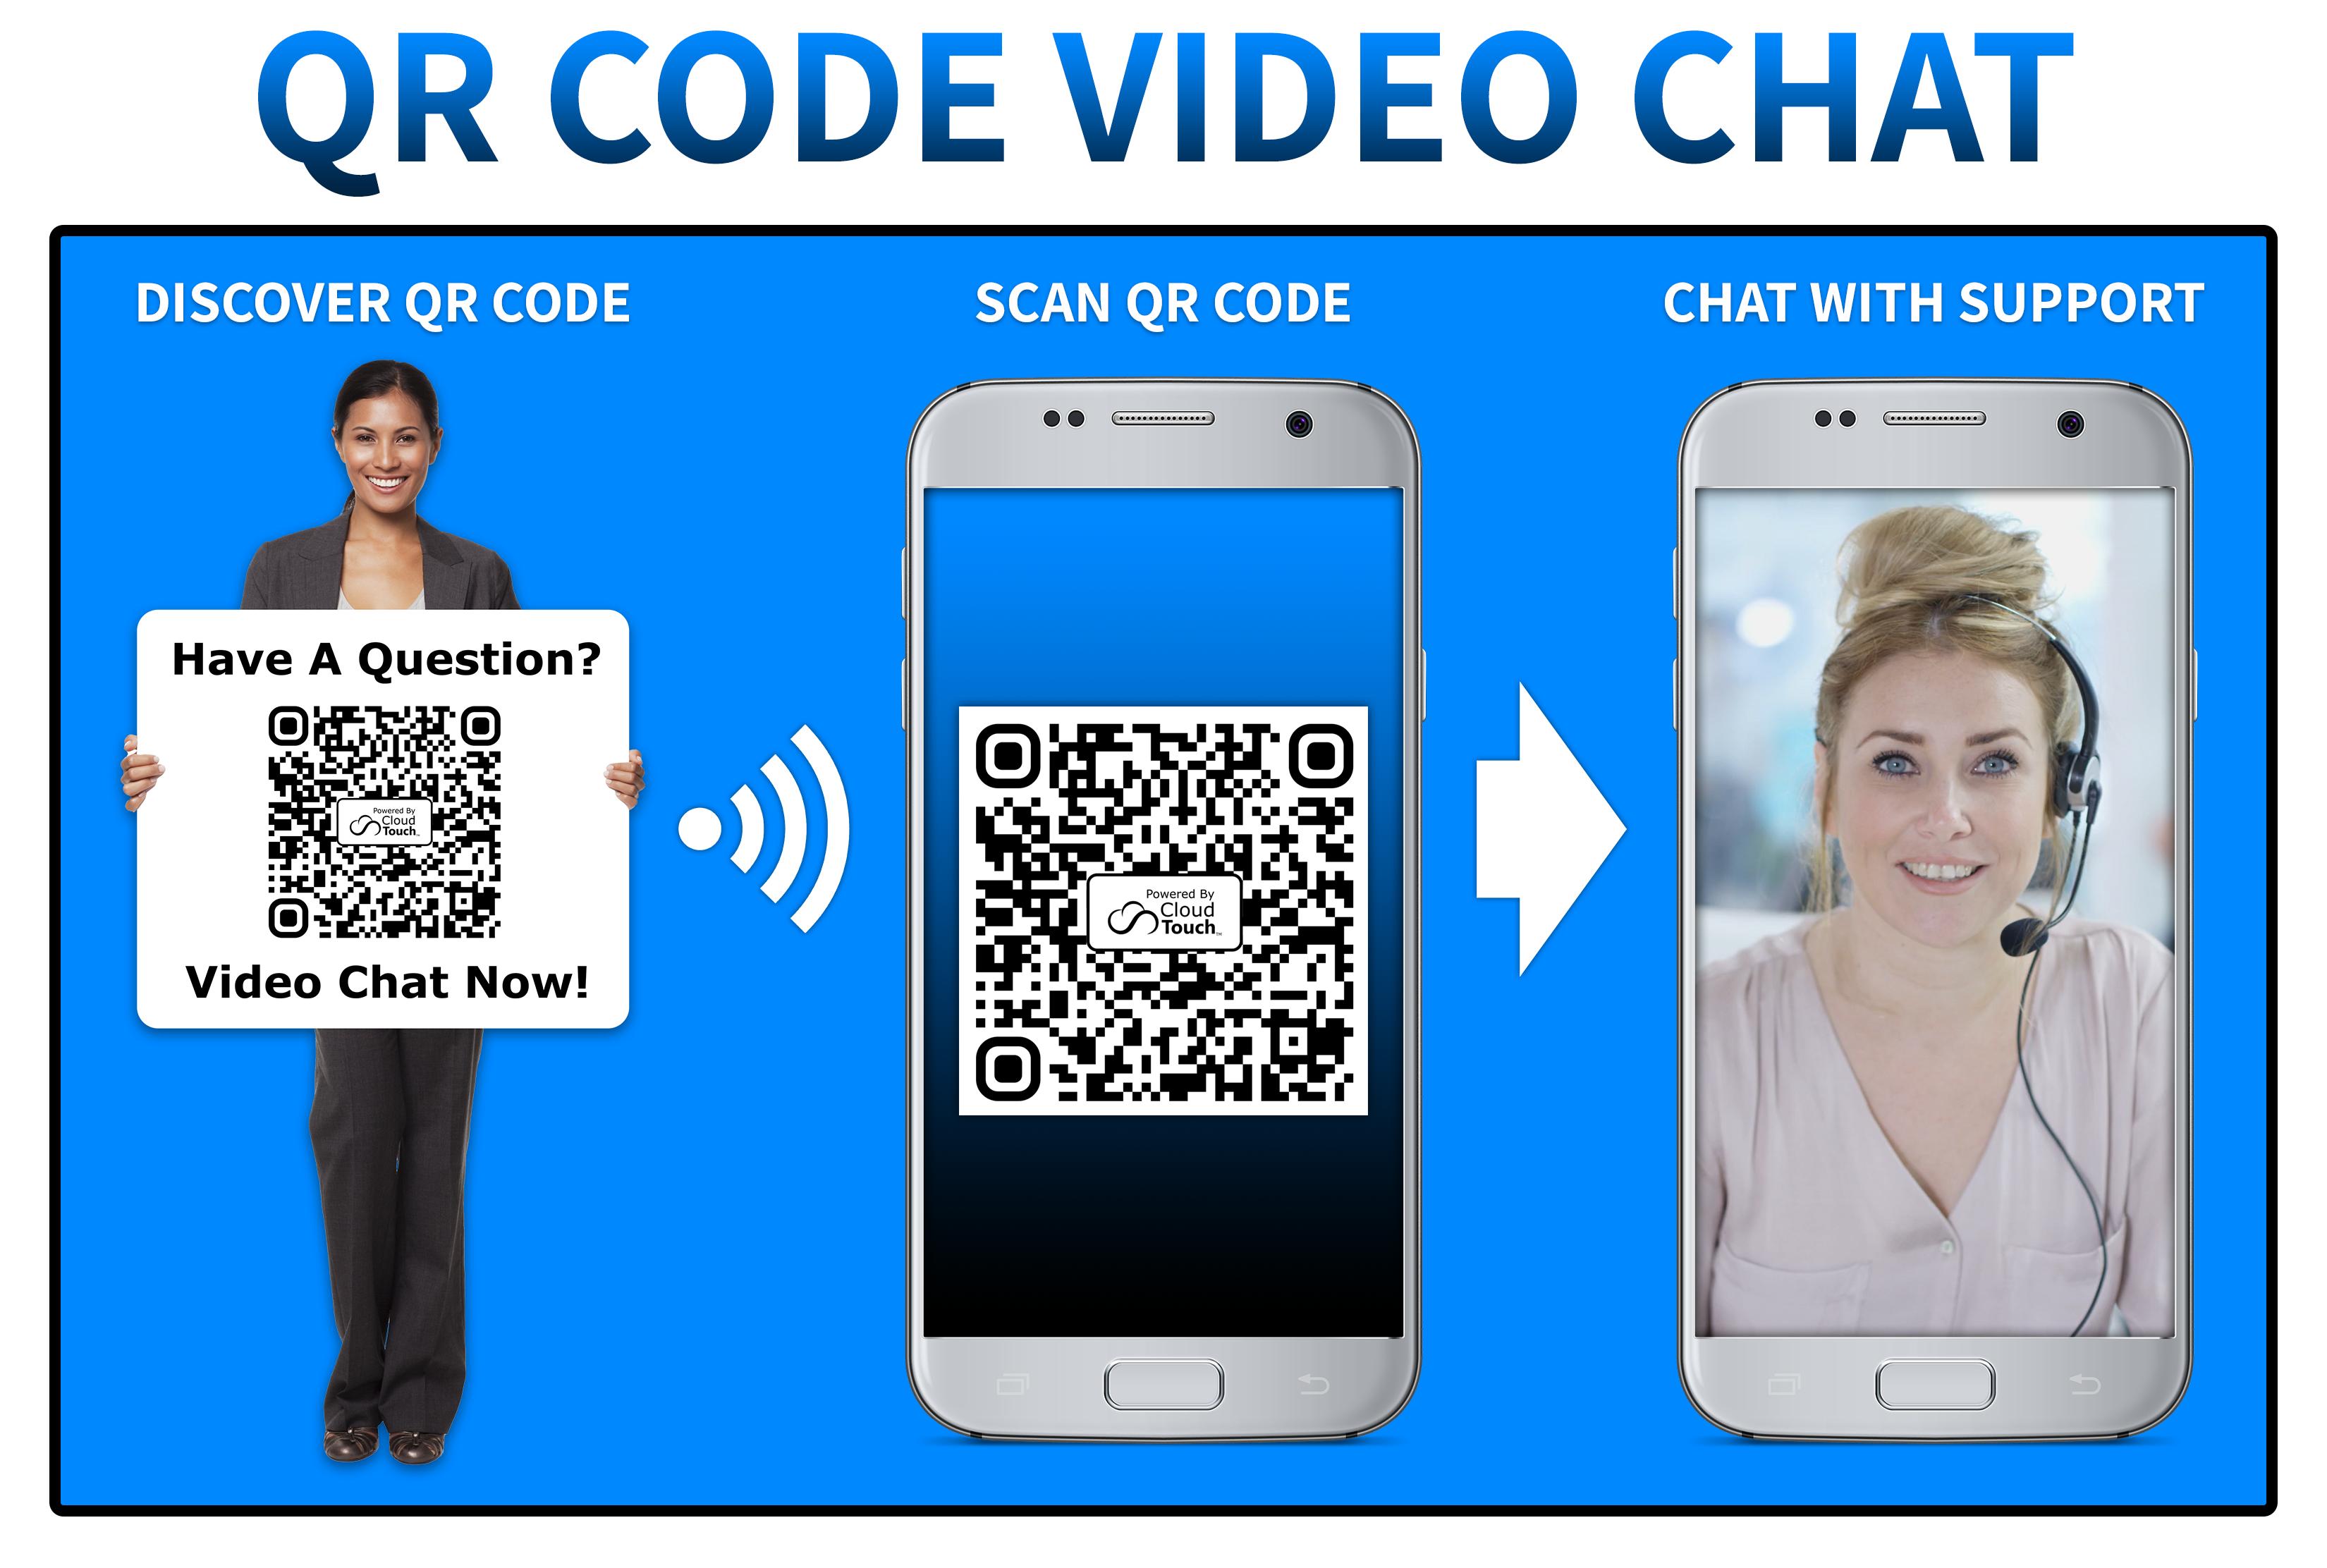 QR code video chat no logo